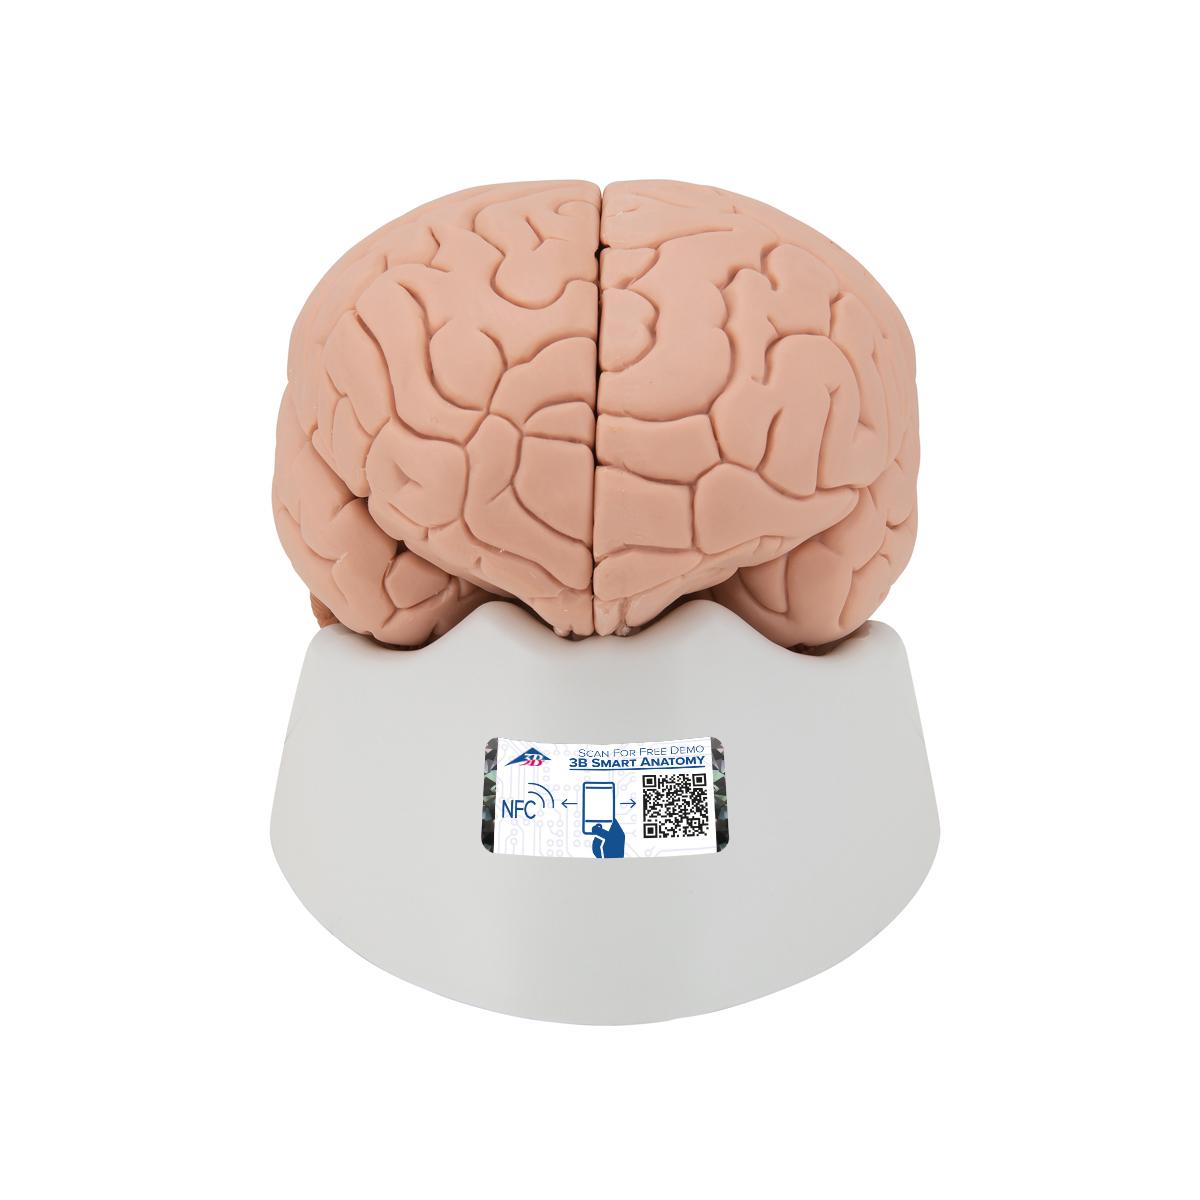 Gehirn, 4-teilig - 1000224 - 3B Scientific - C16 - Gehirn Modelle ...